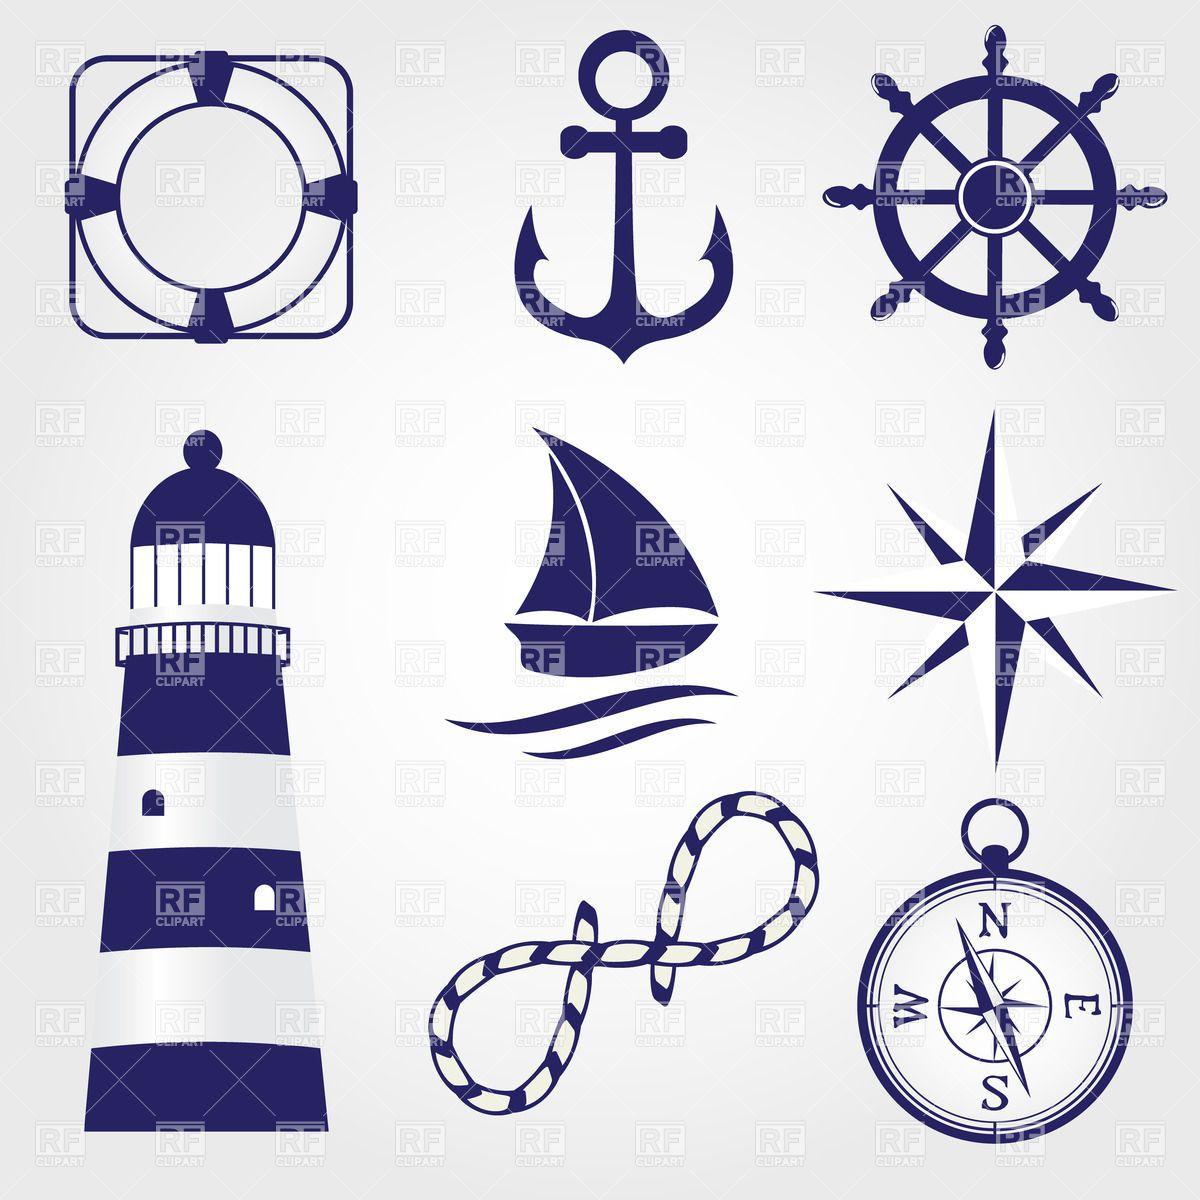 Nautical Symbols And Meanings nautical symbols - Goo...